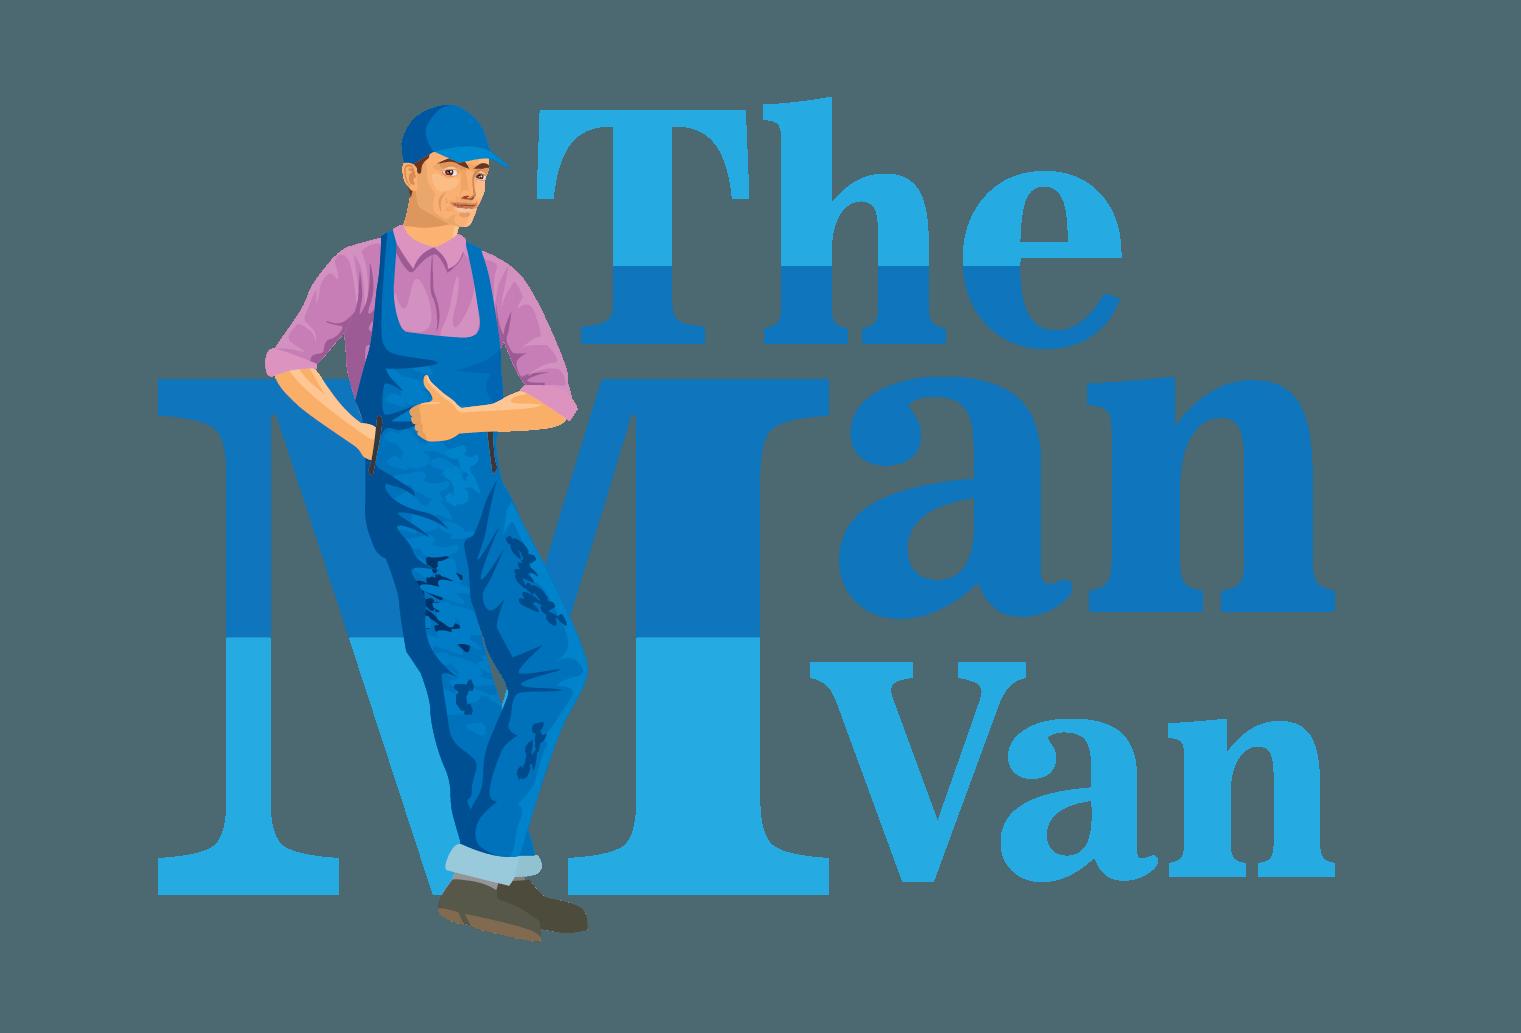 Man and van at The man van